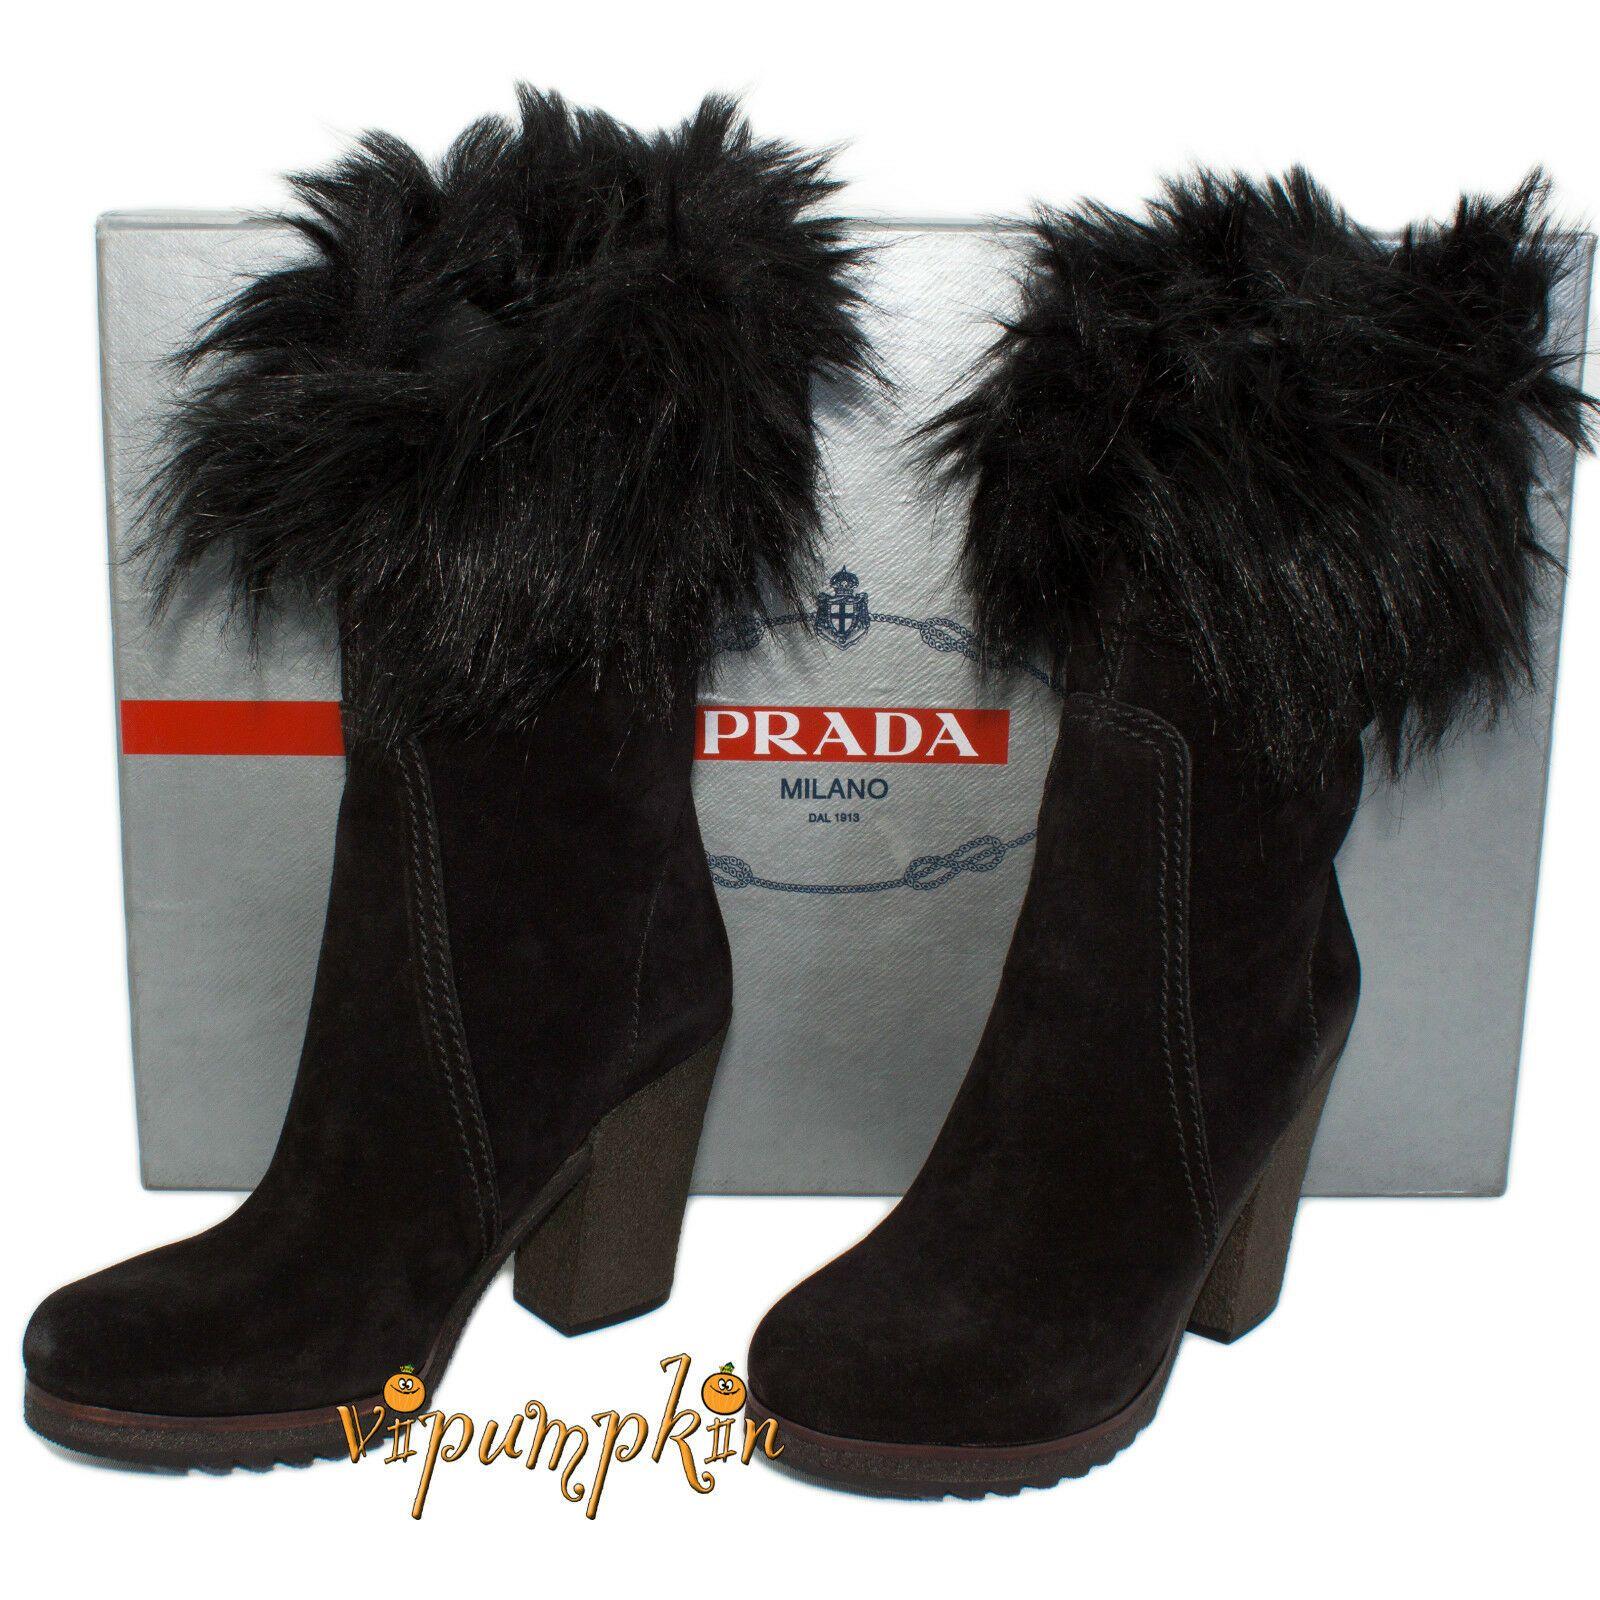 Prada Suede Fur Cuff Mid Calf Boot Deserto: PRADA BLACK NERO SUEDE MID CALF FAUX FUR CUFF BOOTS